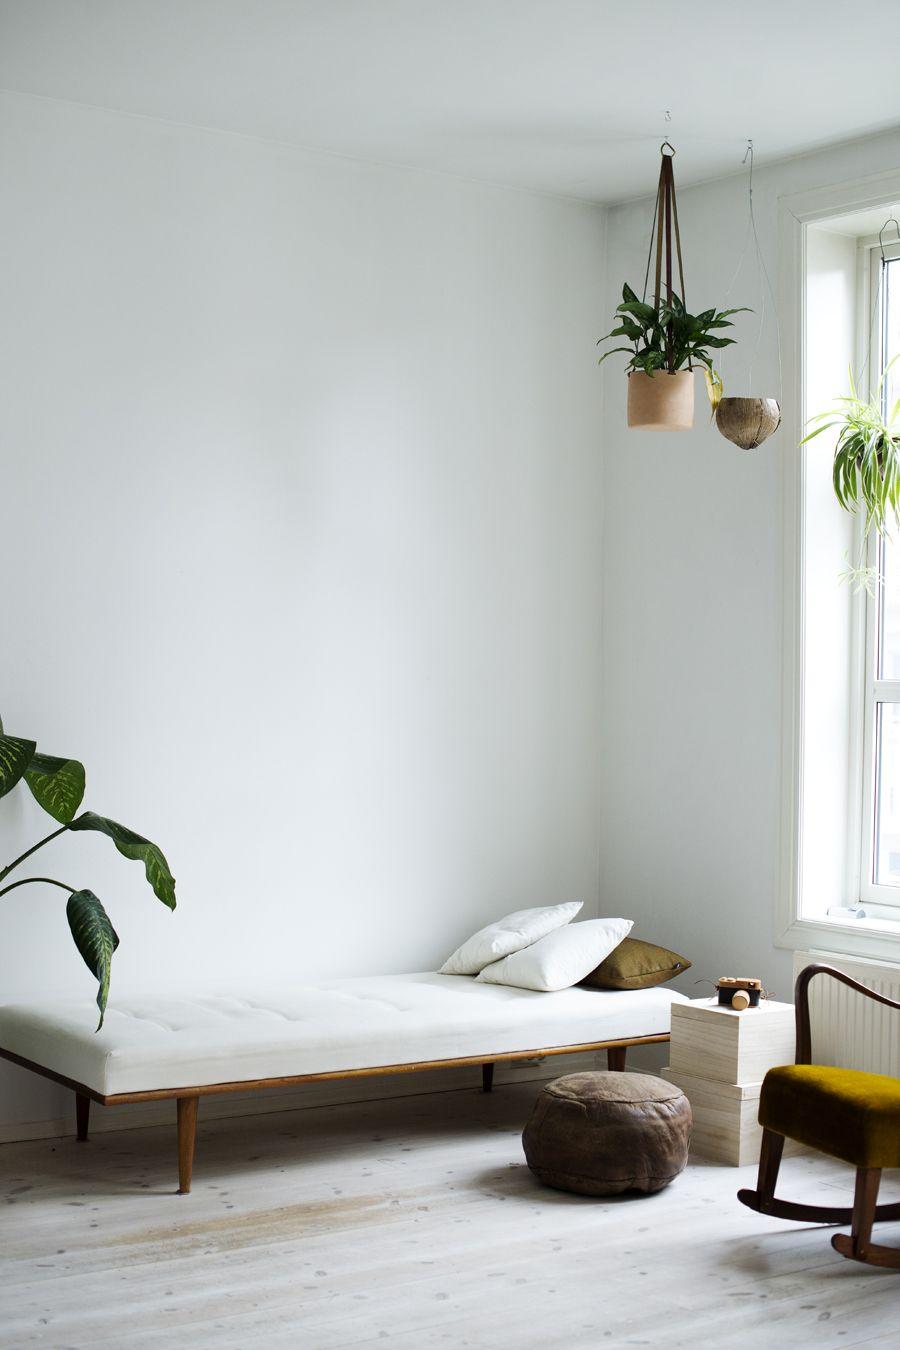 Diy Dagseng Hos Charlott Pettersen Home Inspiration